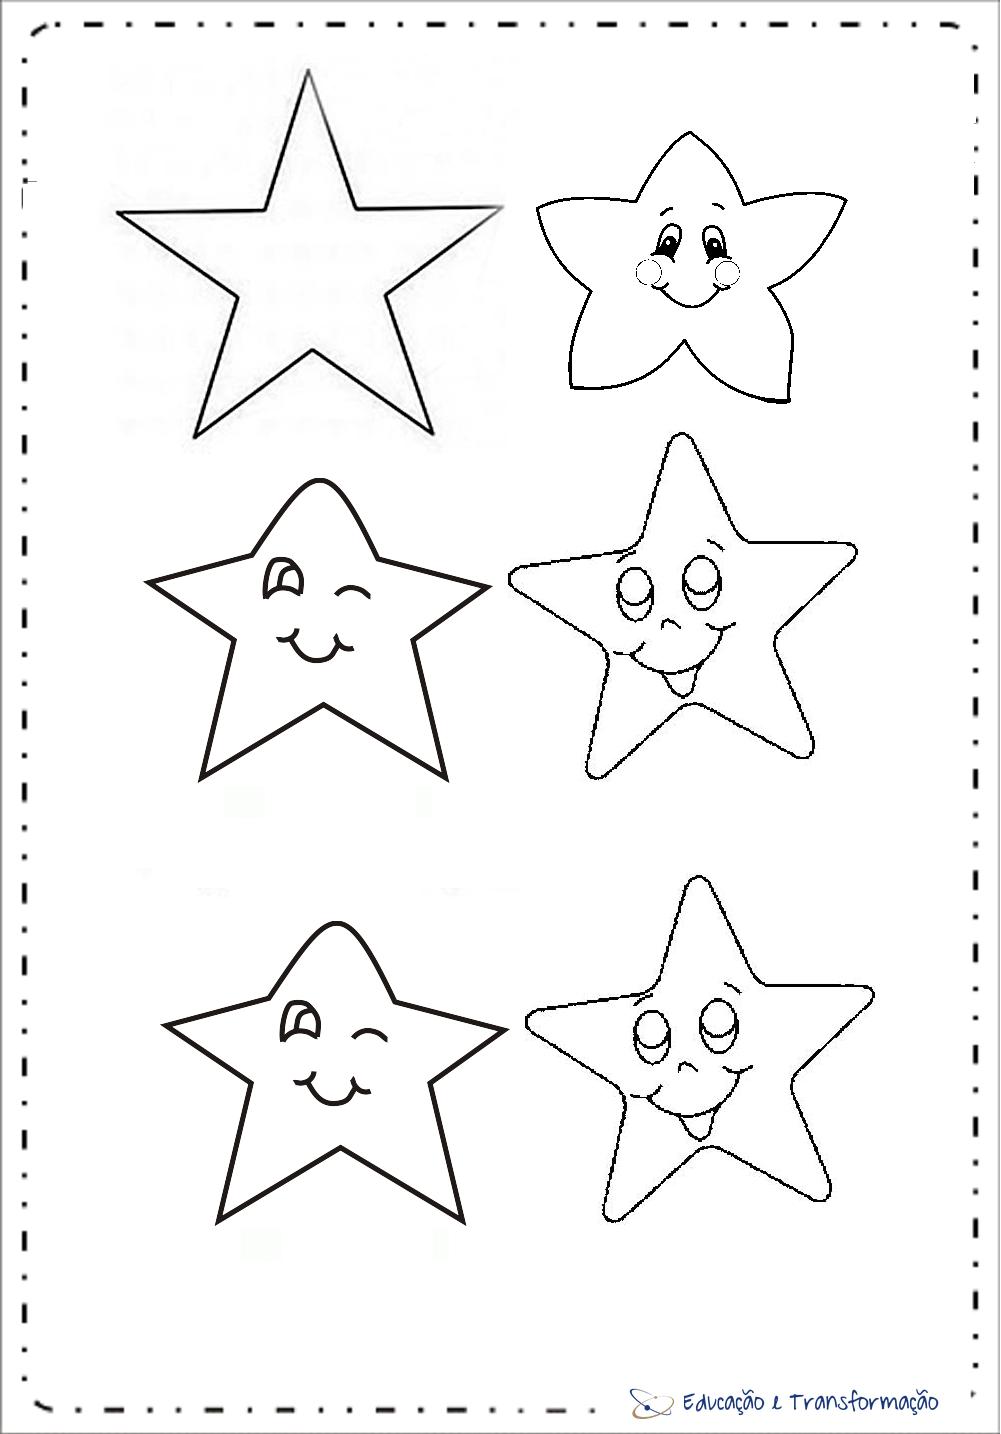 Capas para caderno - Moldes para imprimir